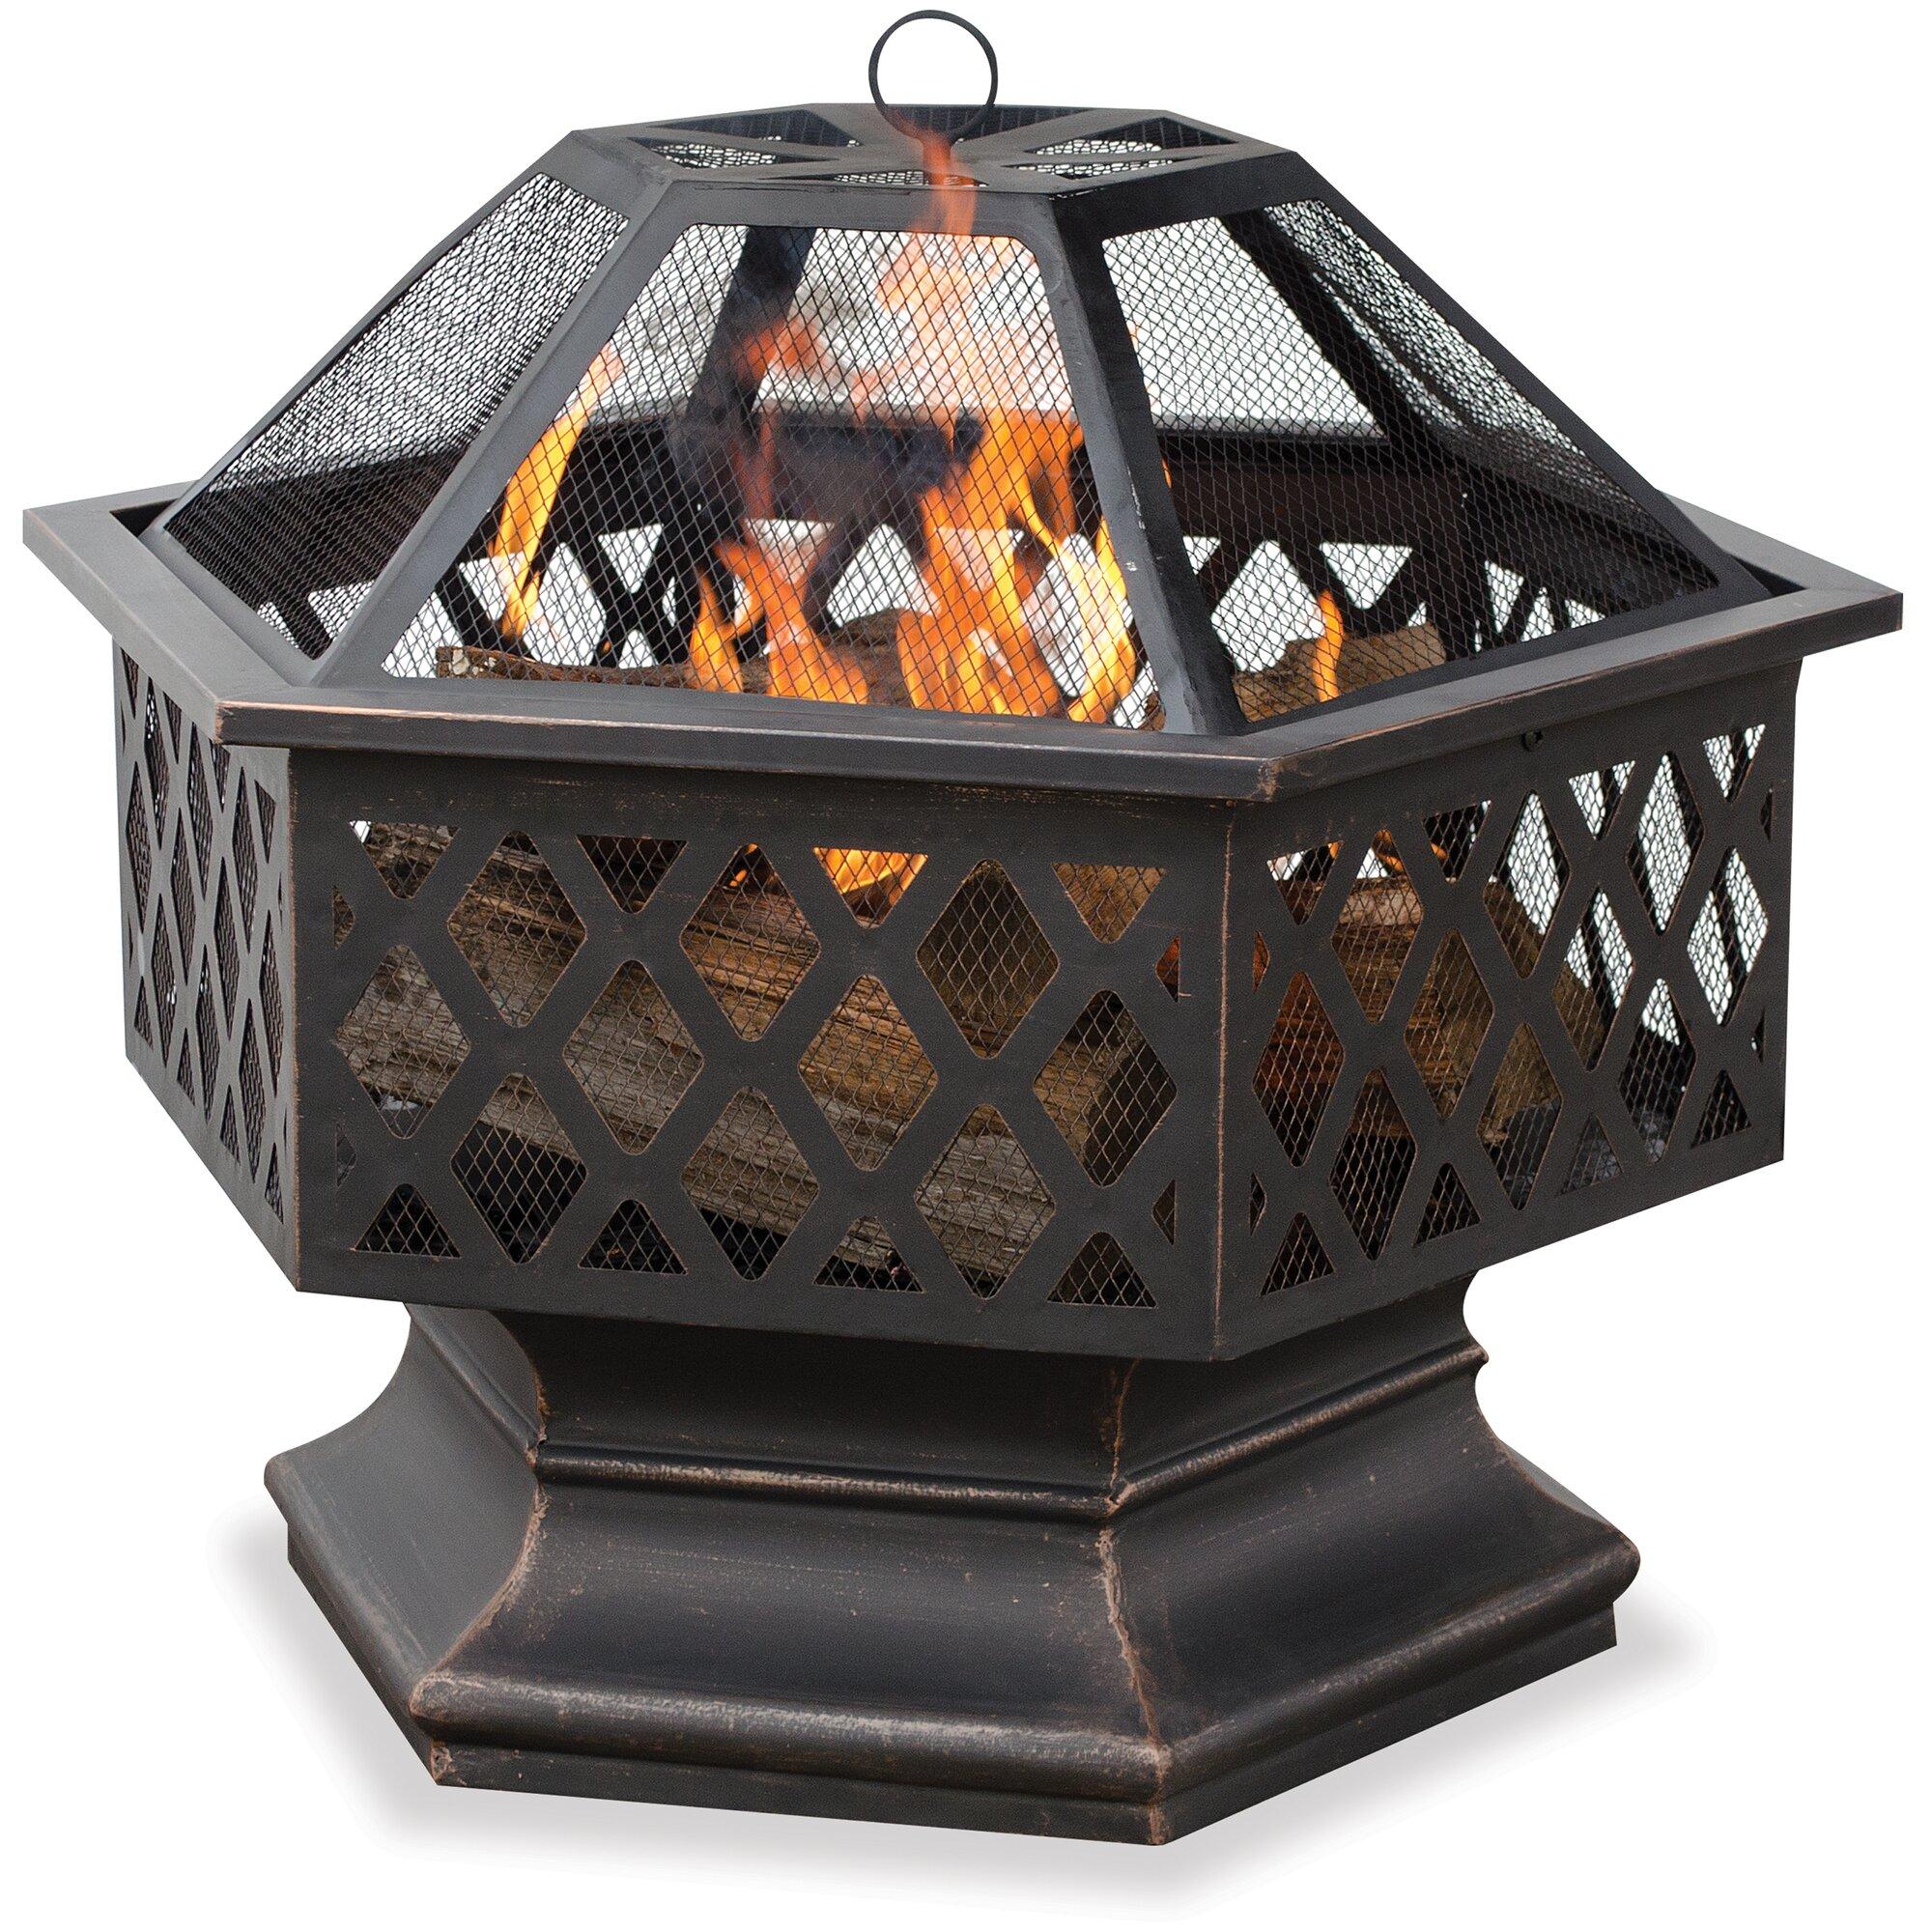 blacksmith custom designed fireplace log holder hand forged steel